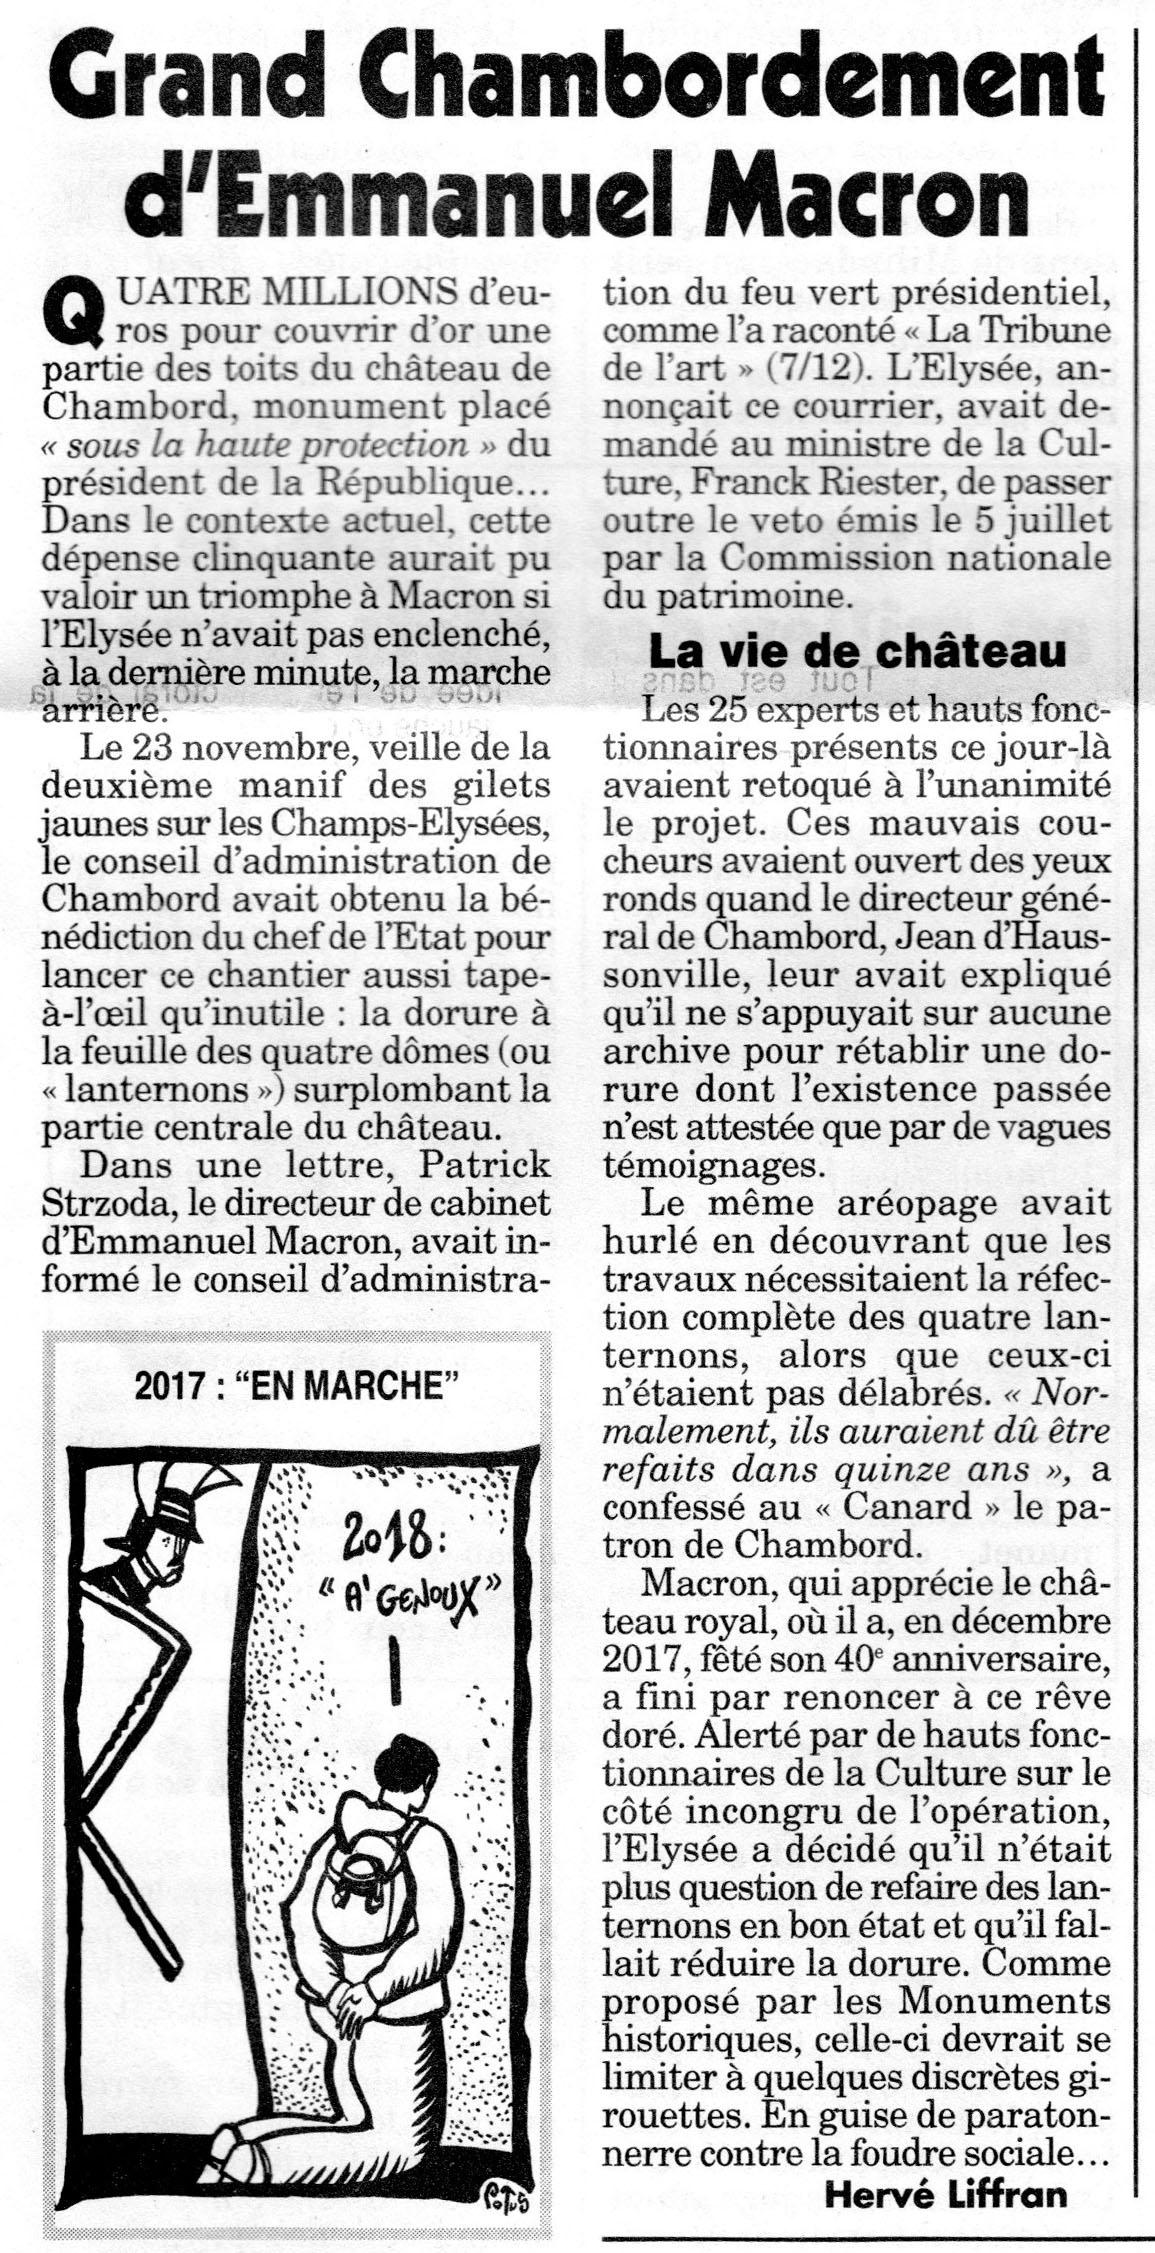 Chambord20181214_15330793.jpg